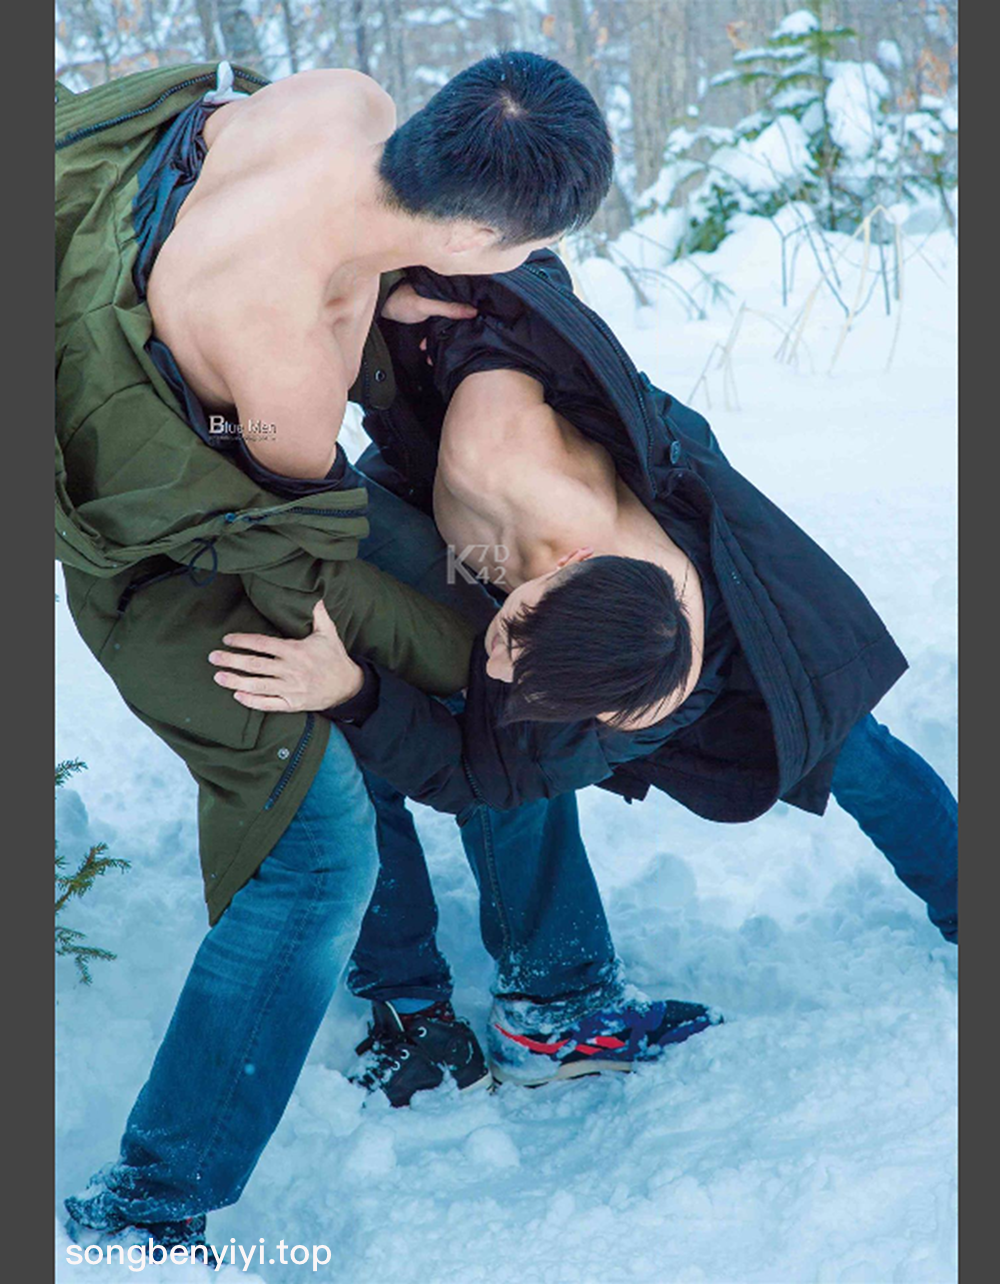 WHOSEMAN NO.13阿部&安東尼-追尋白色戀人的浪漫【藝術全見版】【ebook】-122.png